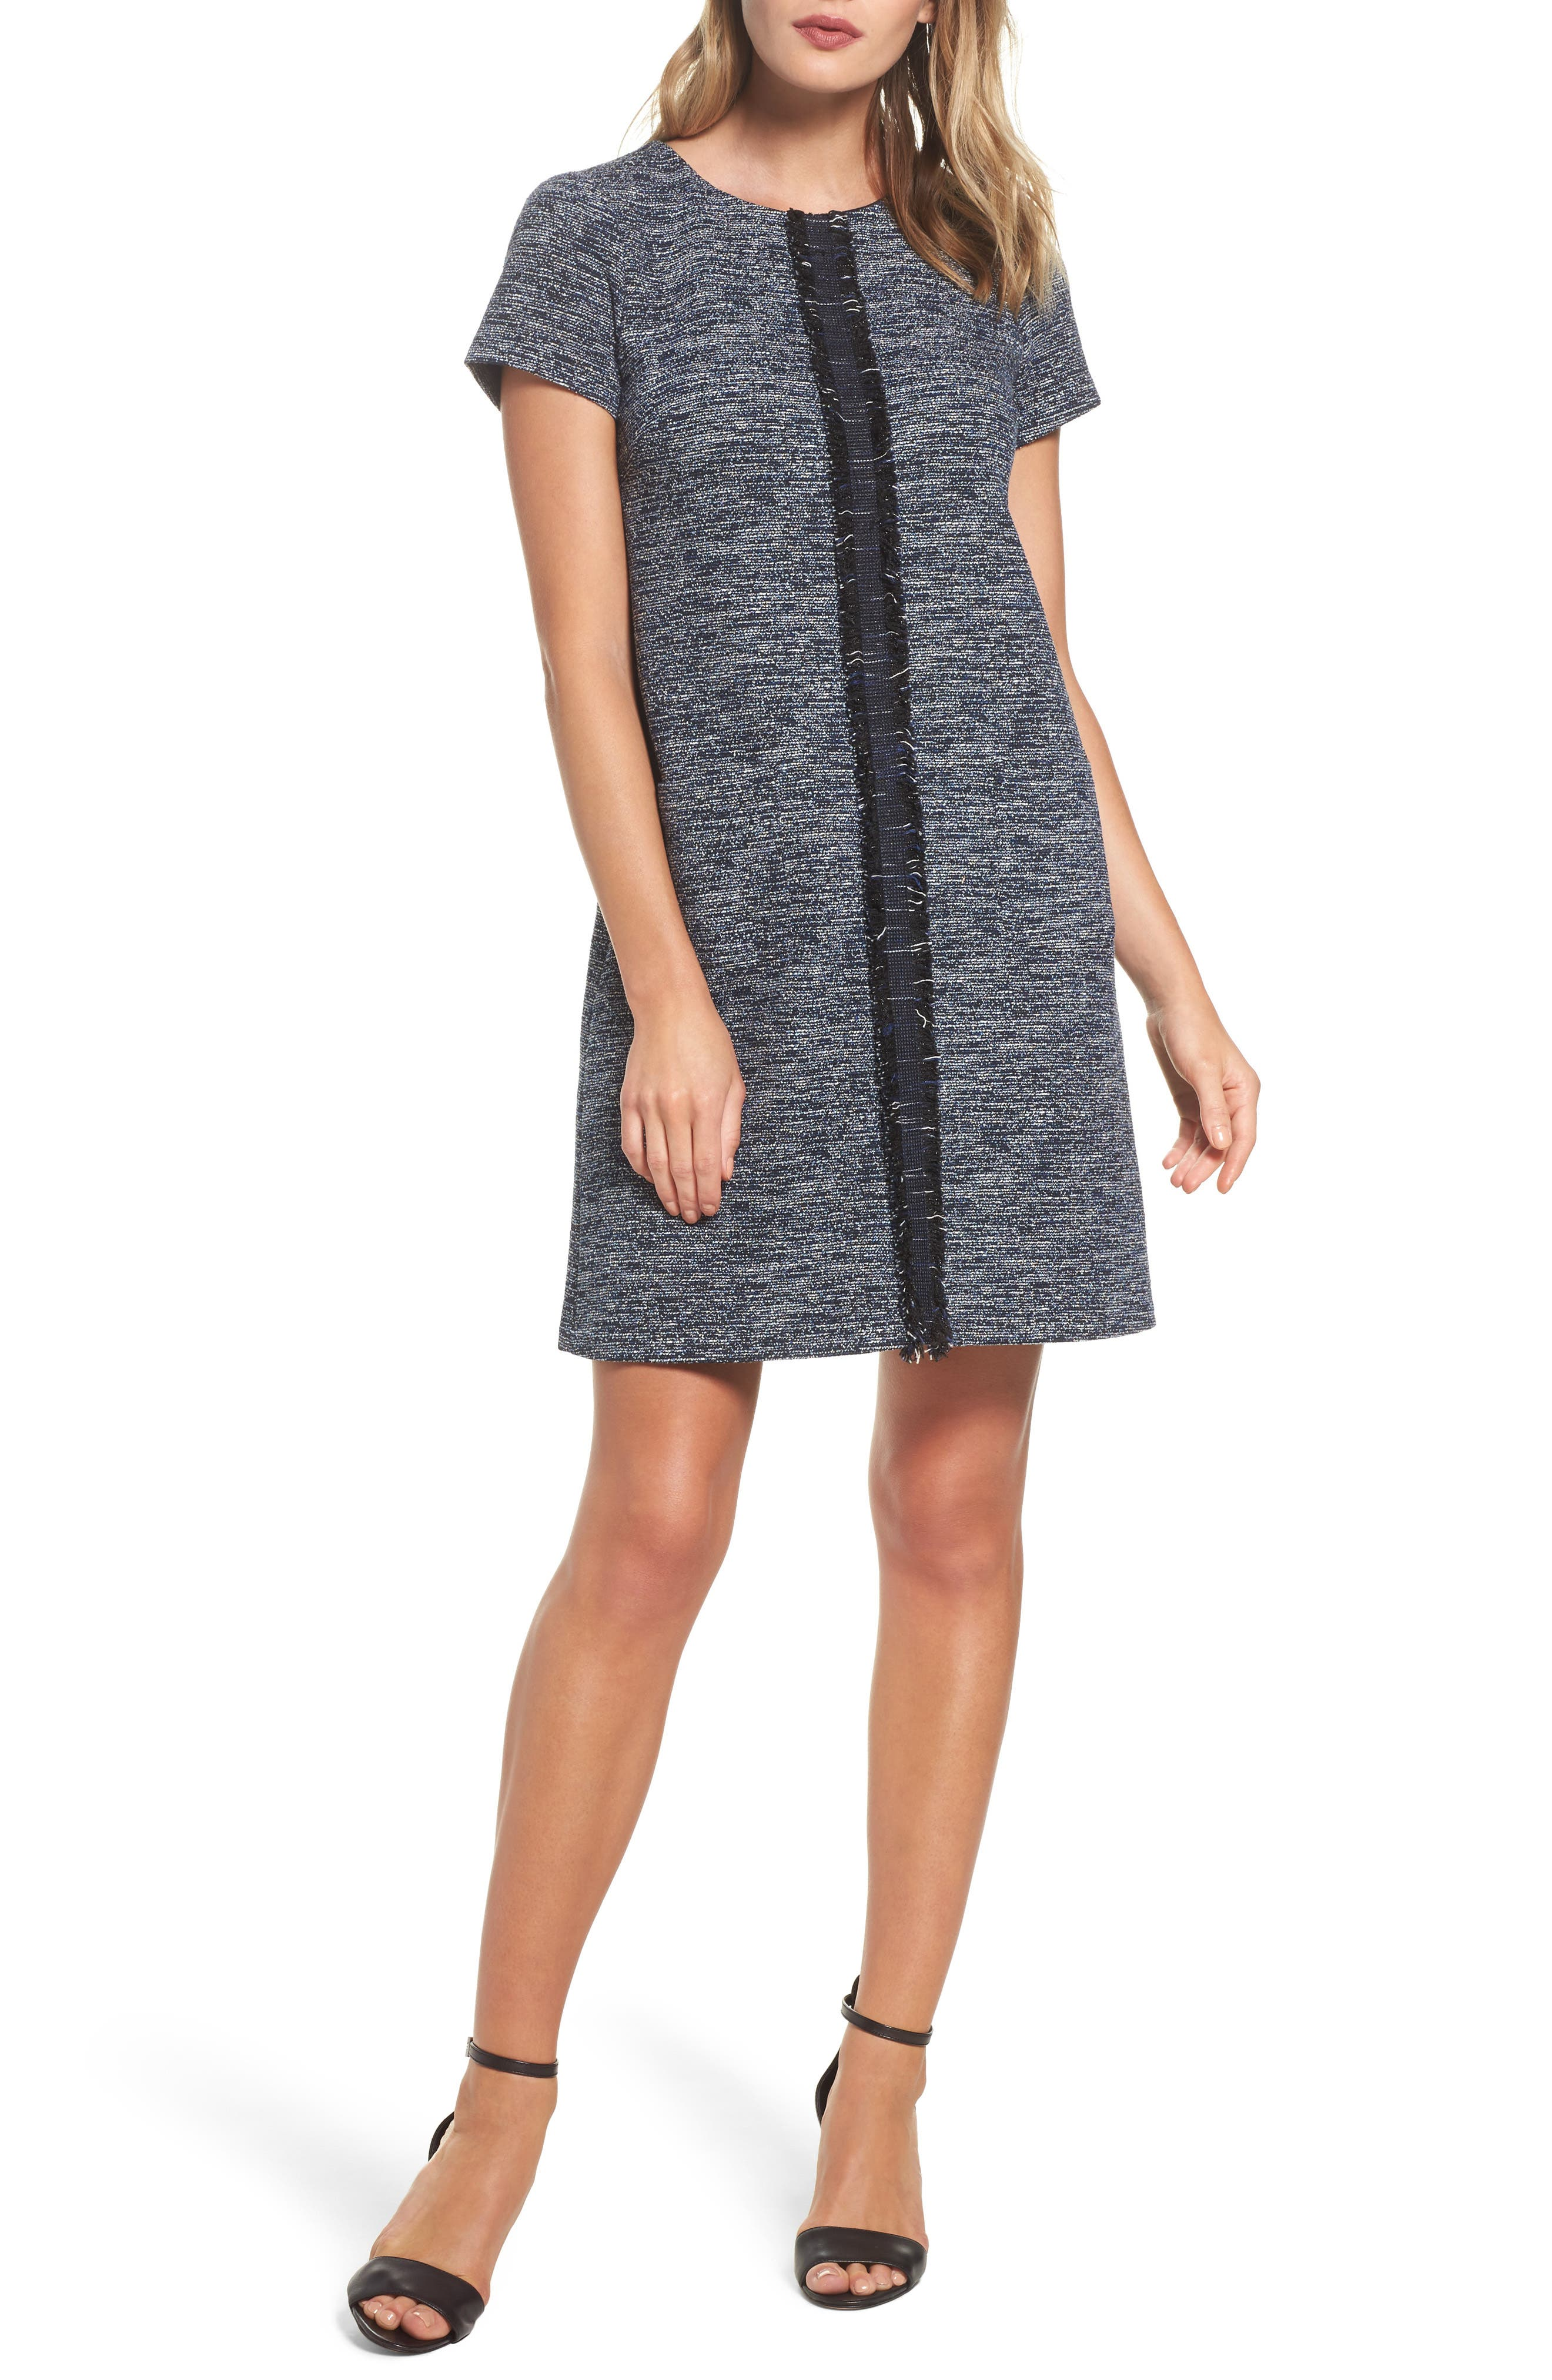 Main Image - Adrianna Papell Knit Tweed Shift Dress